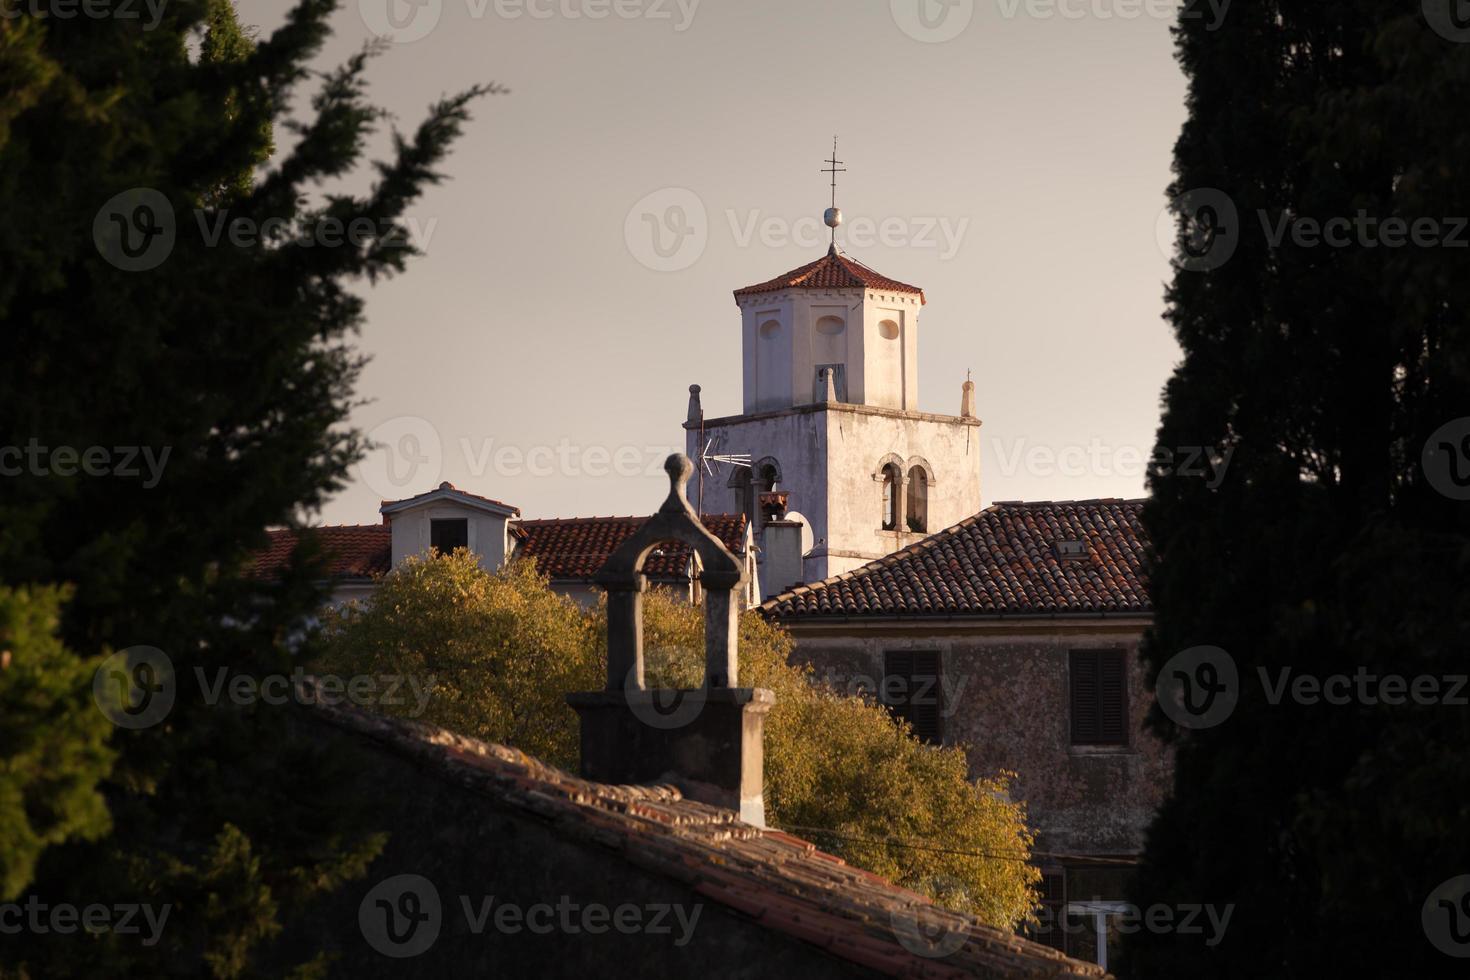 mediterrane kerk in de vroege ochtend foto